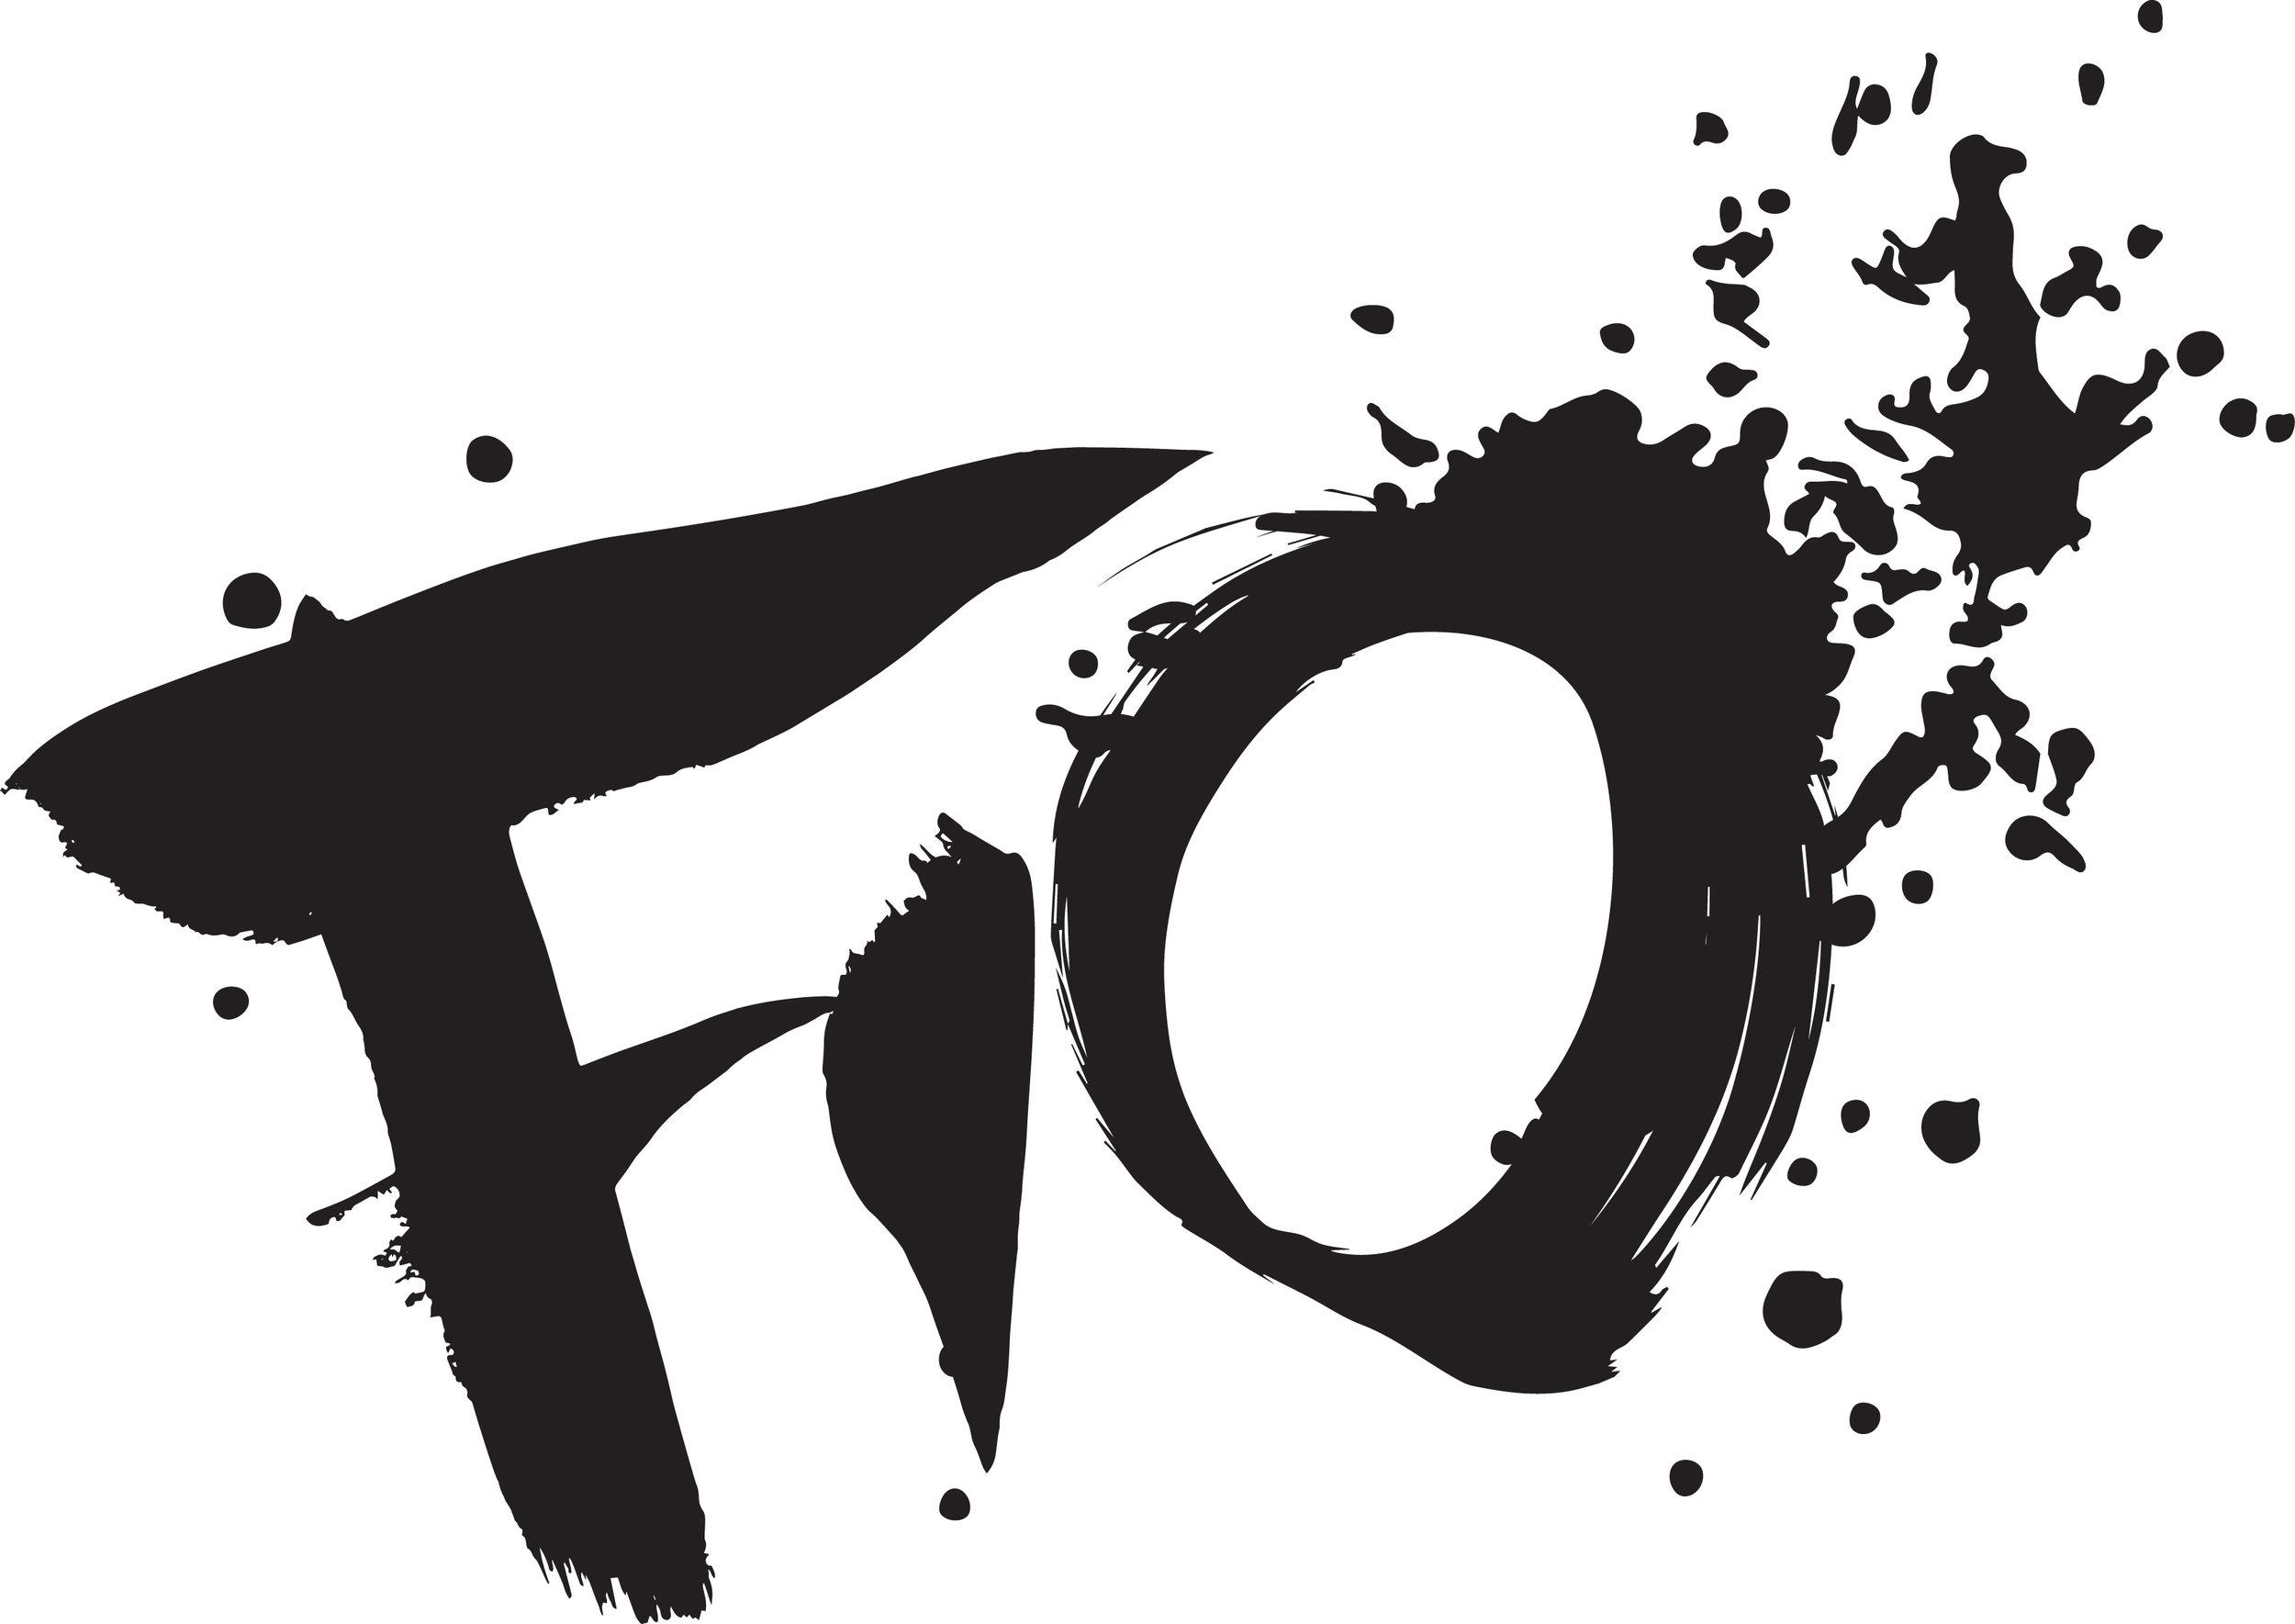 fio logo final black.jpg